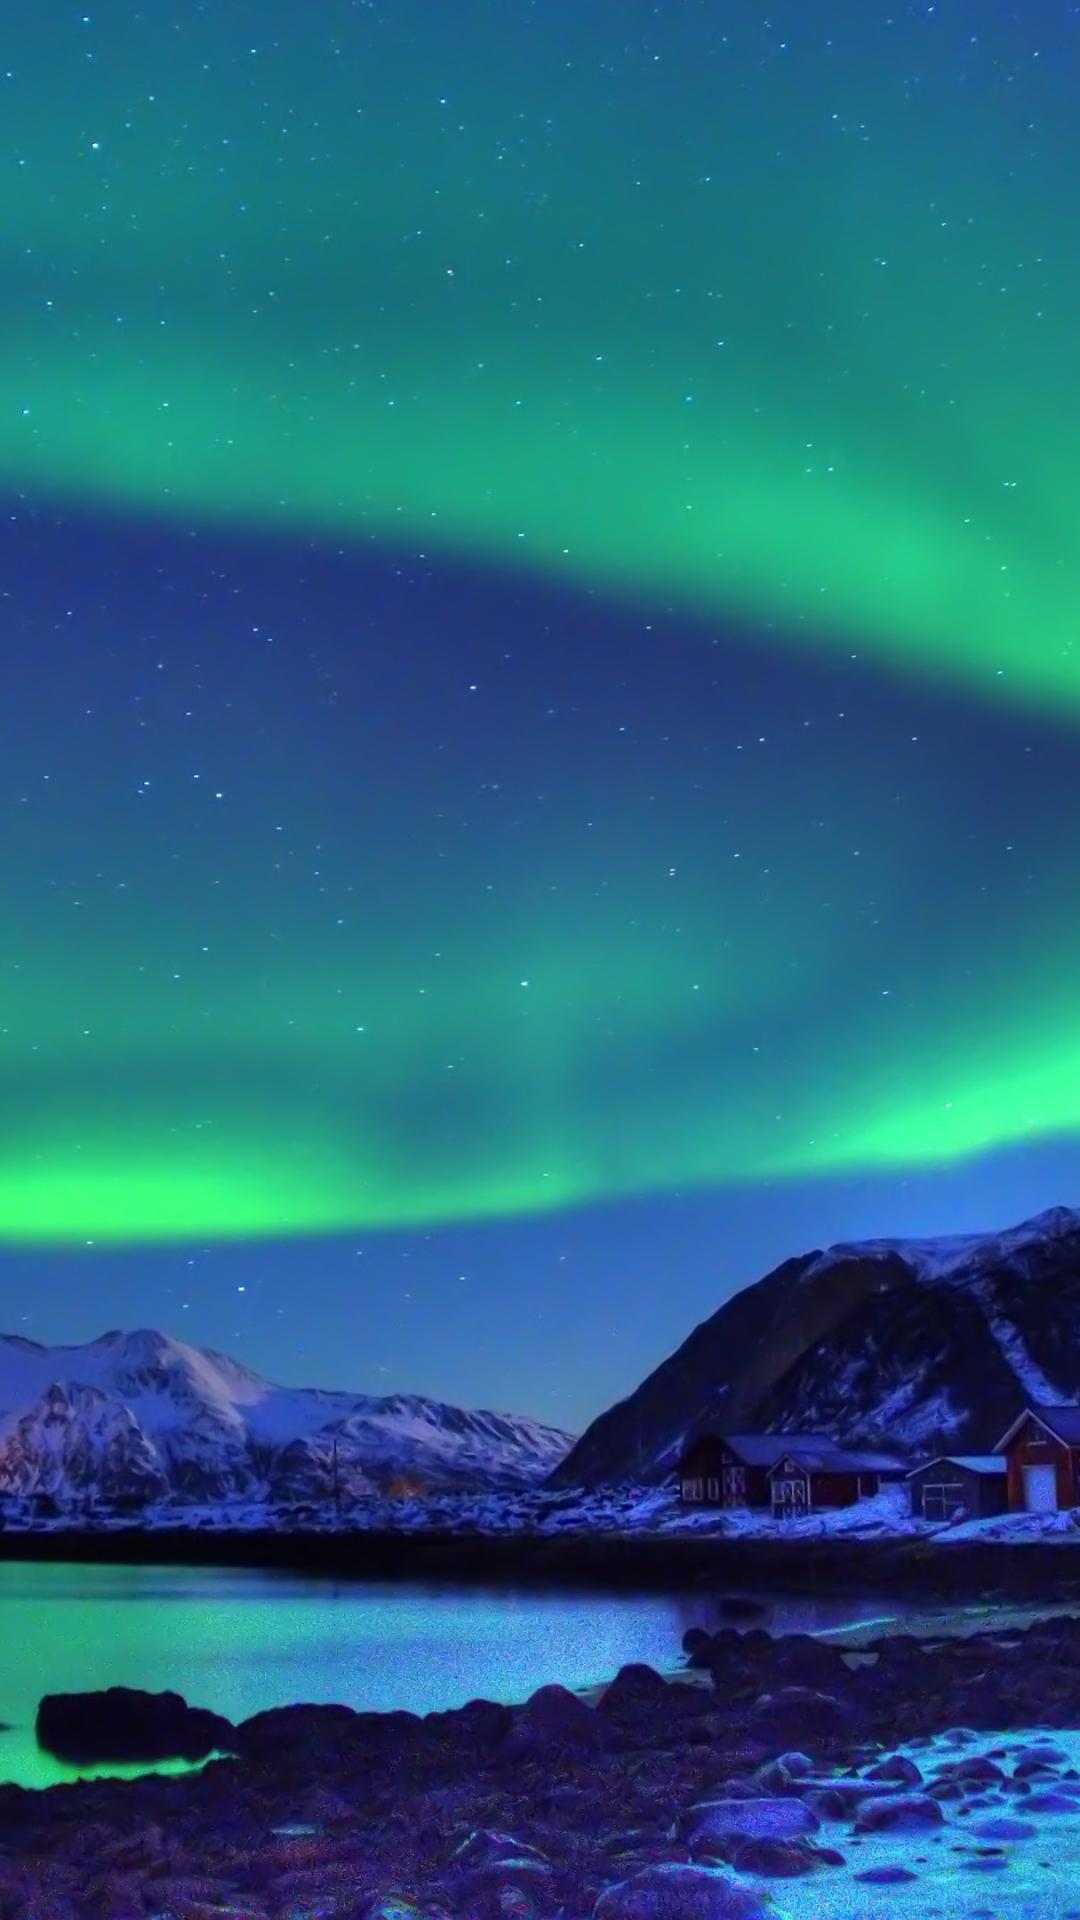 aurora phone wallpaper - photo #12